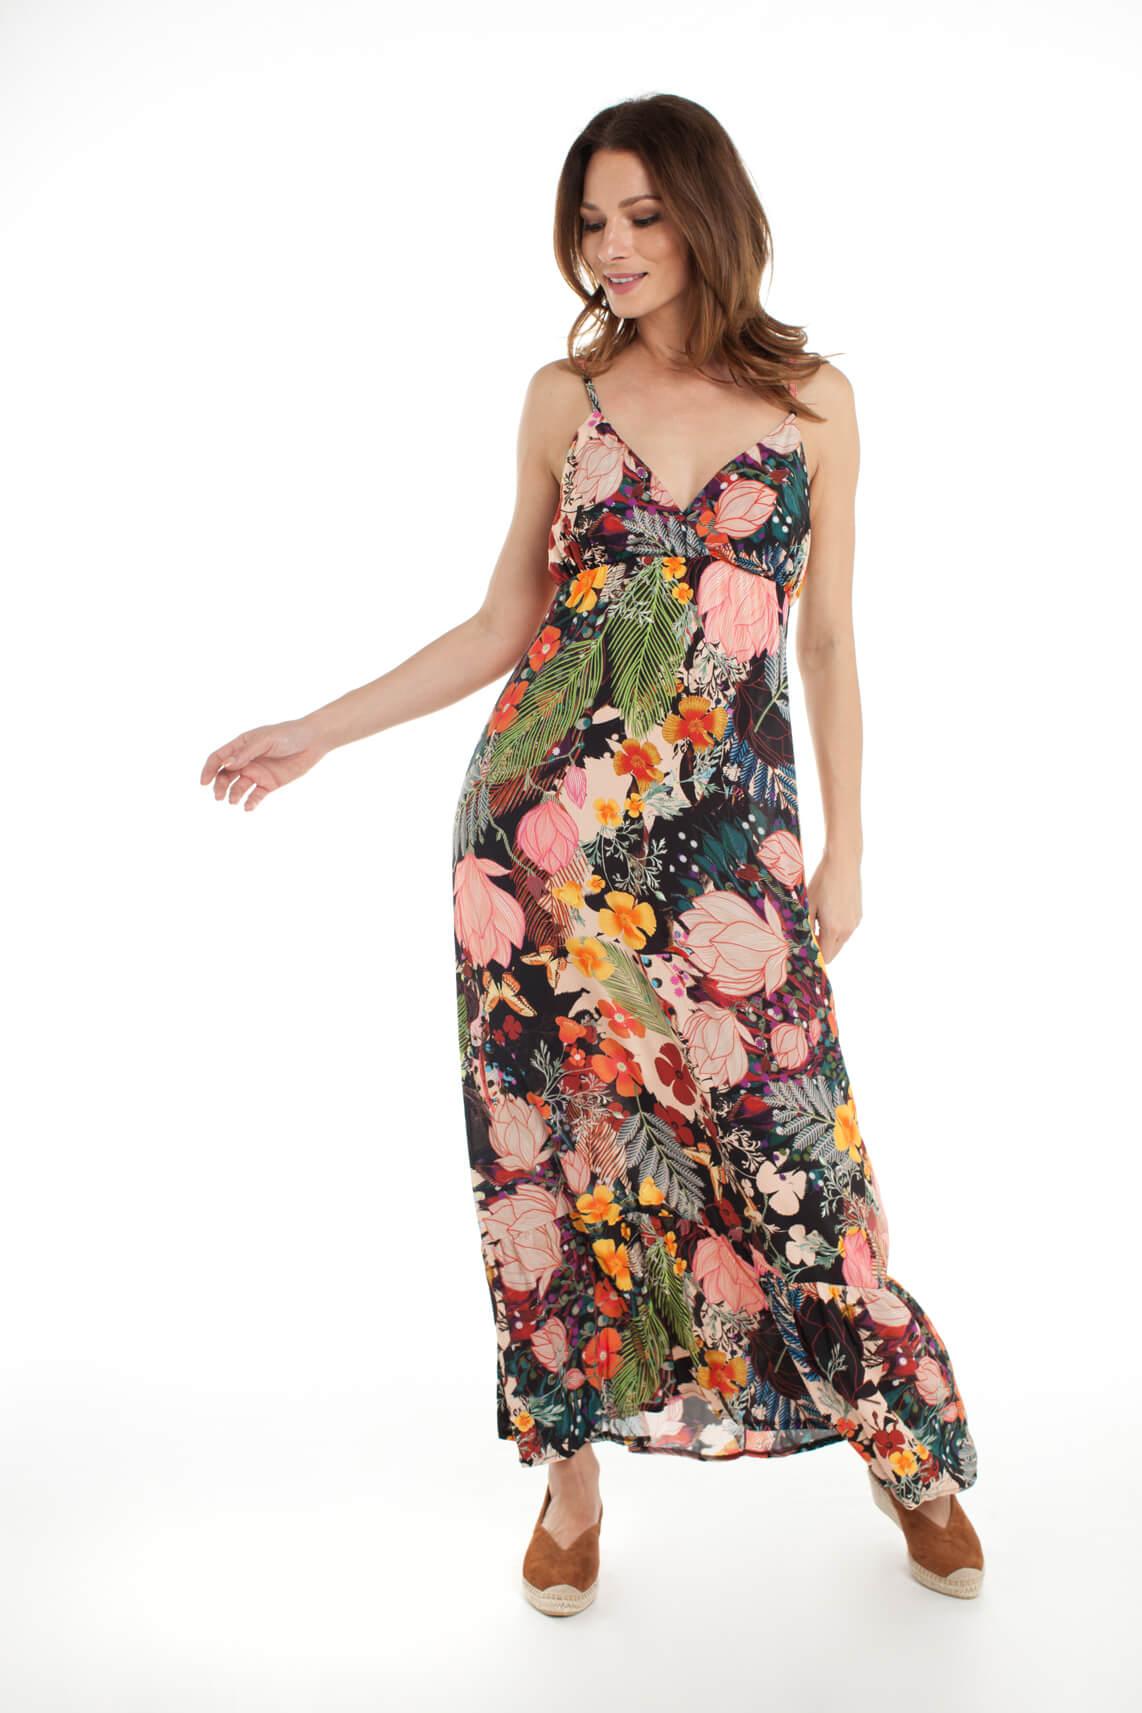 La Fée Maraboutée Dames Lange jurk met bloemenprint zwart